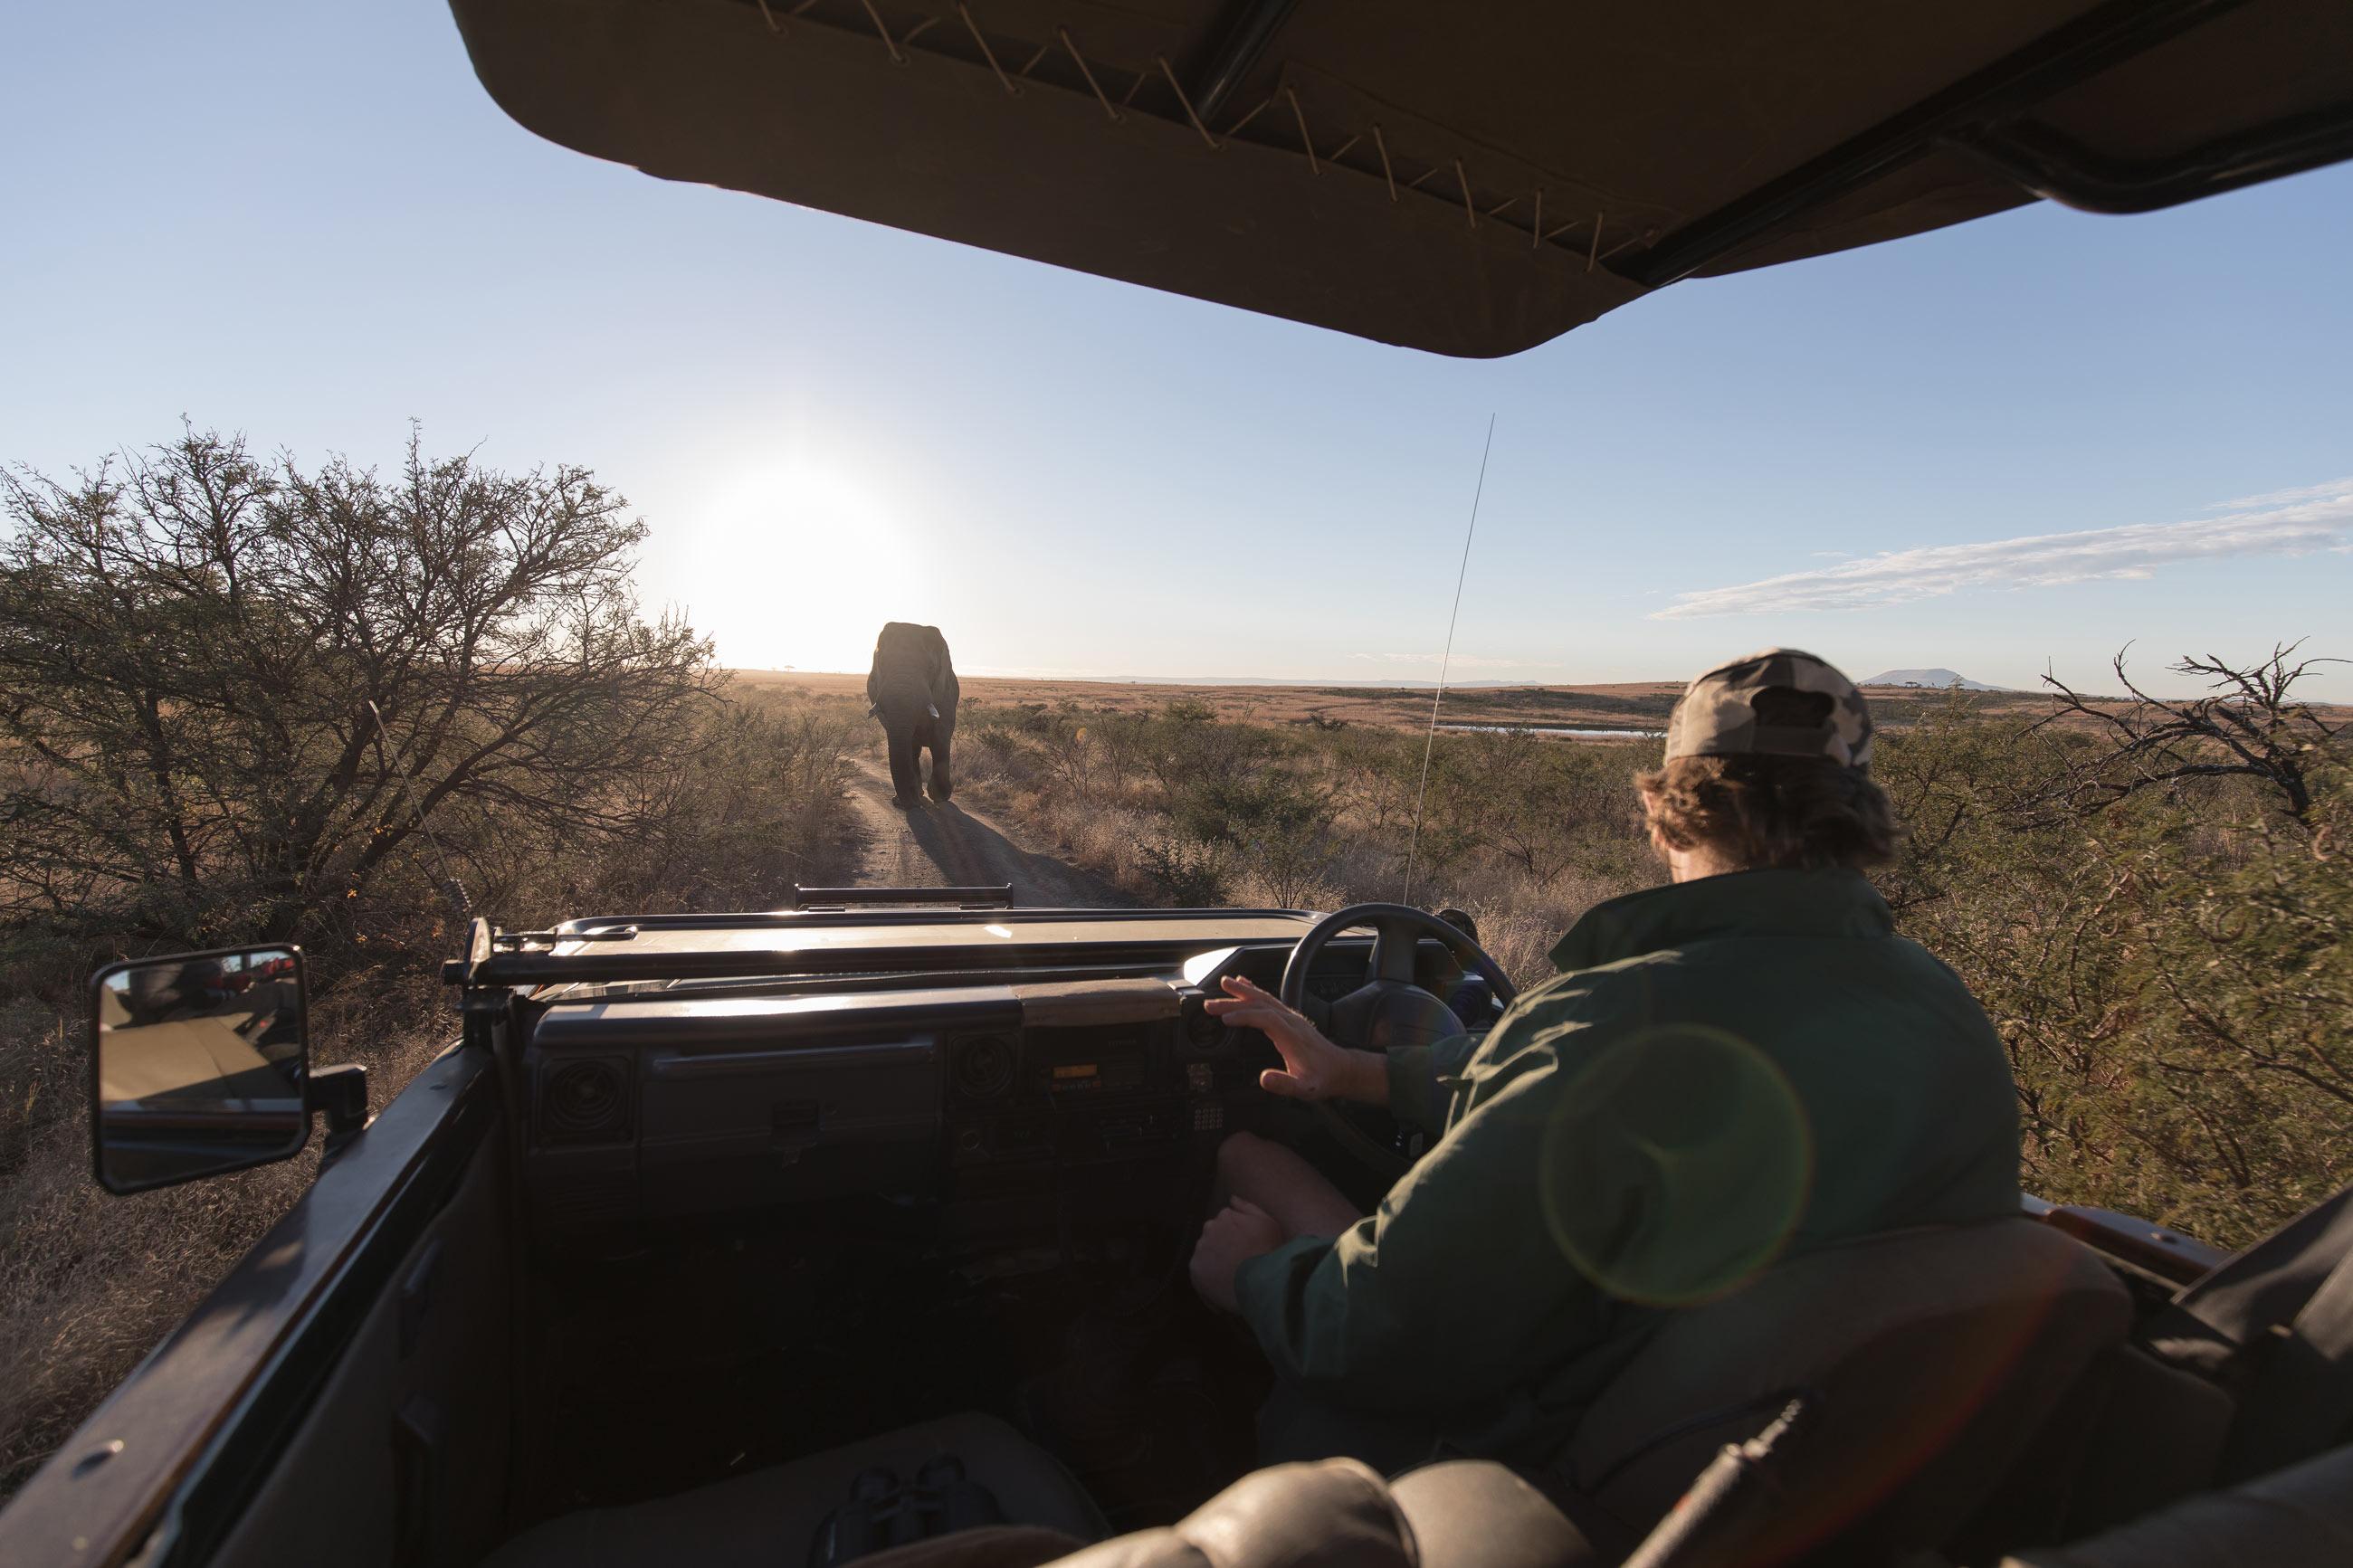 nambiti-game-reserve-south-africa-cheetah-ridge-elephant-sunrise